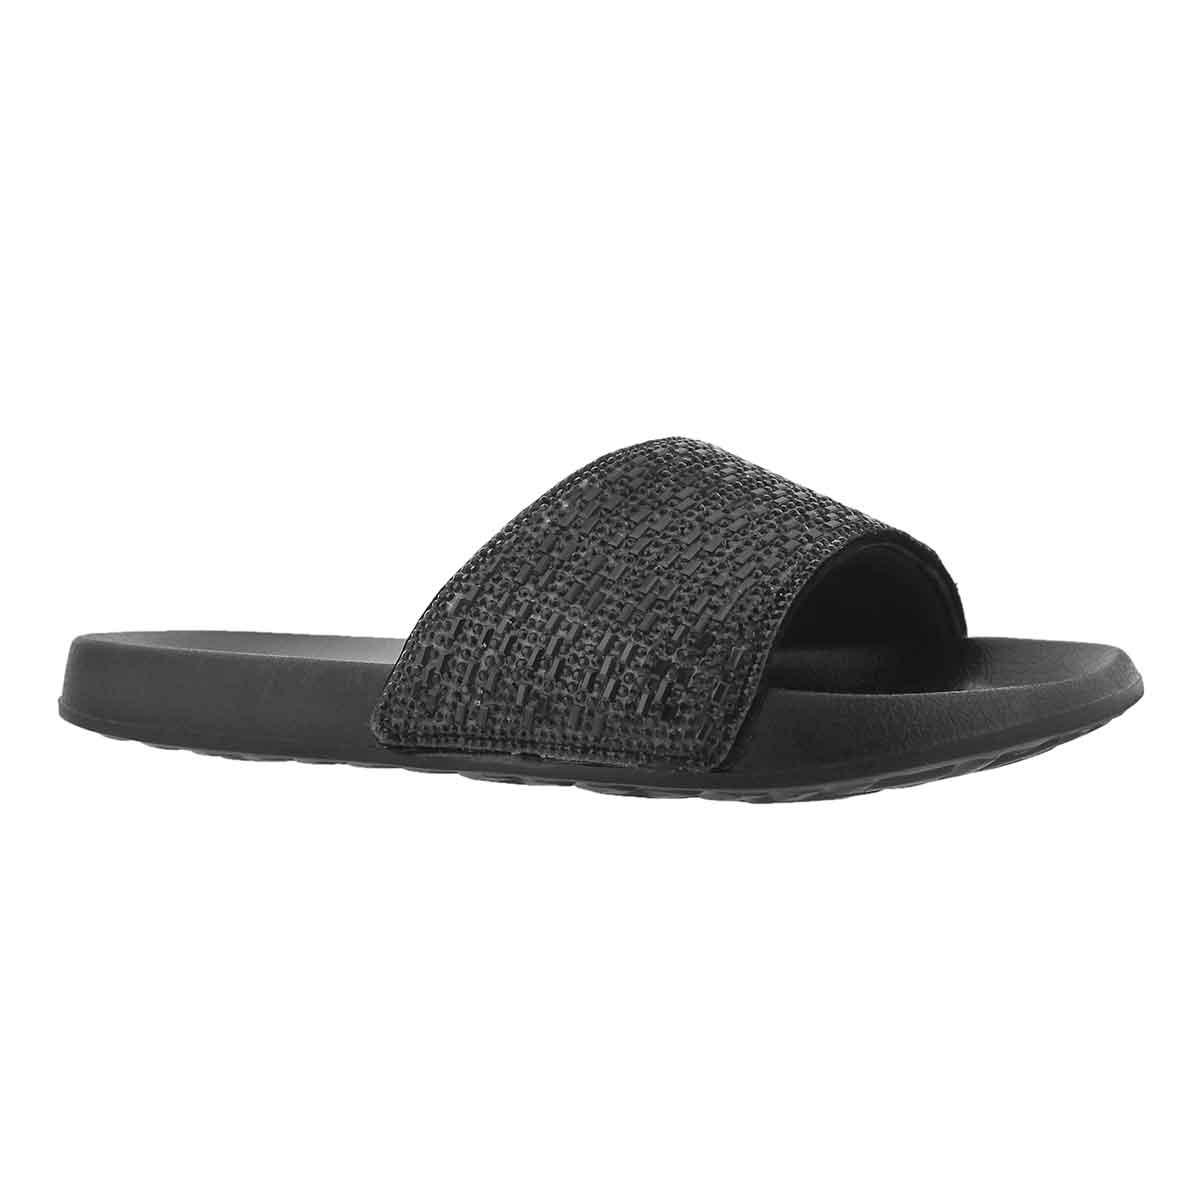 Women's 2nd TAKE SUMMER CHIC black slide sandals